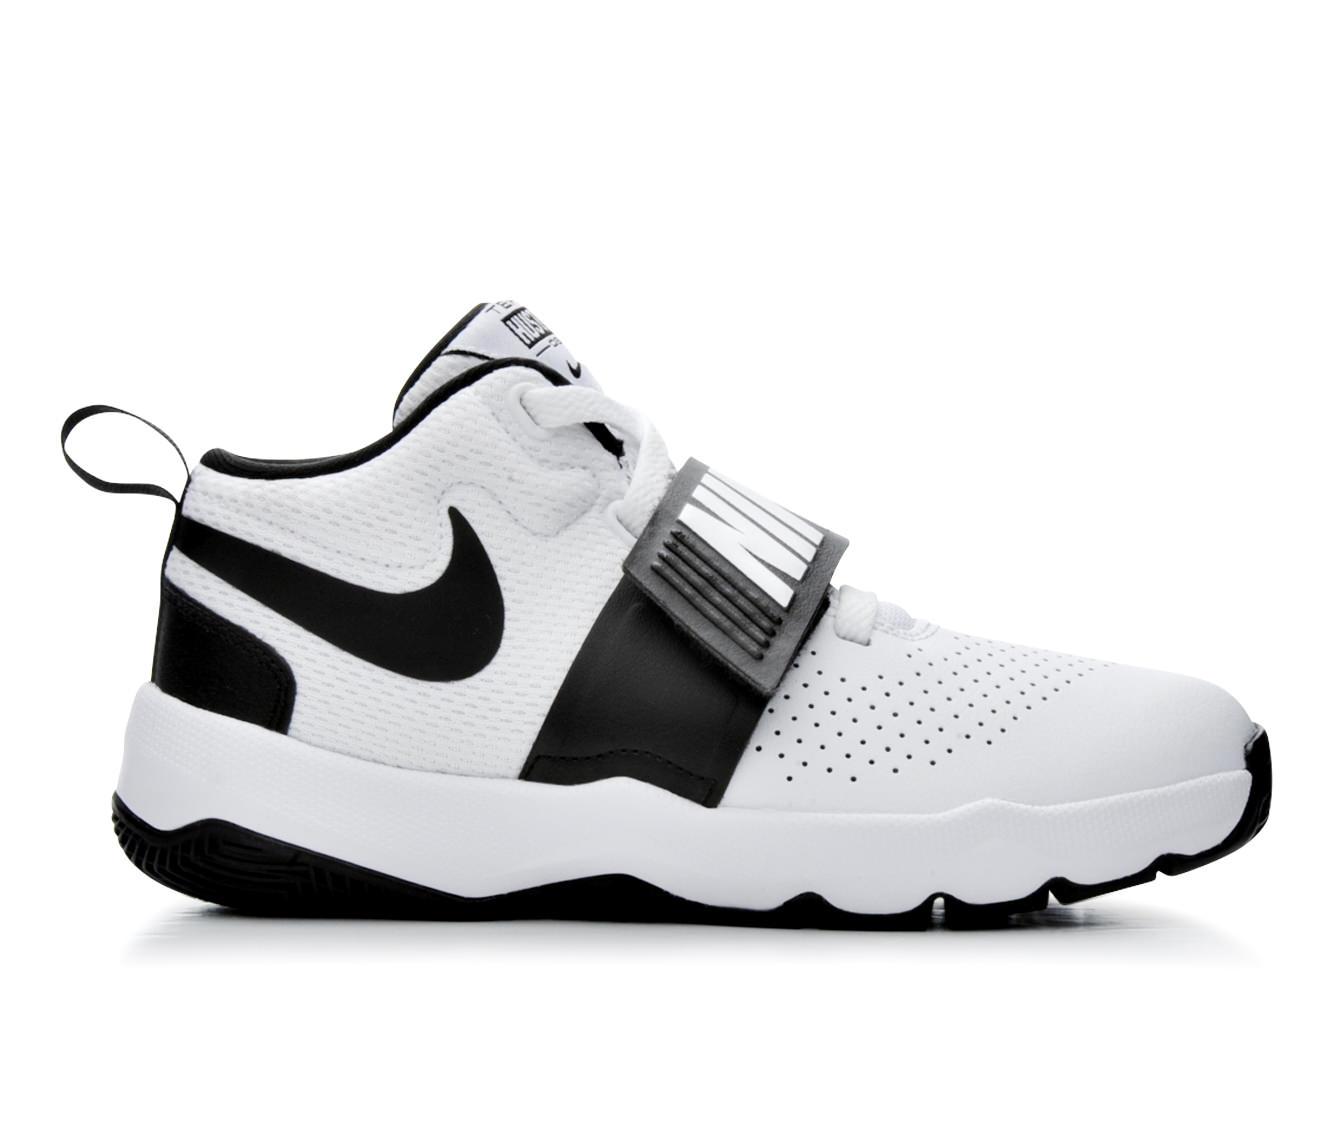 Boys' Nike Team Hustle D8 Basketball Shoes (White)